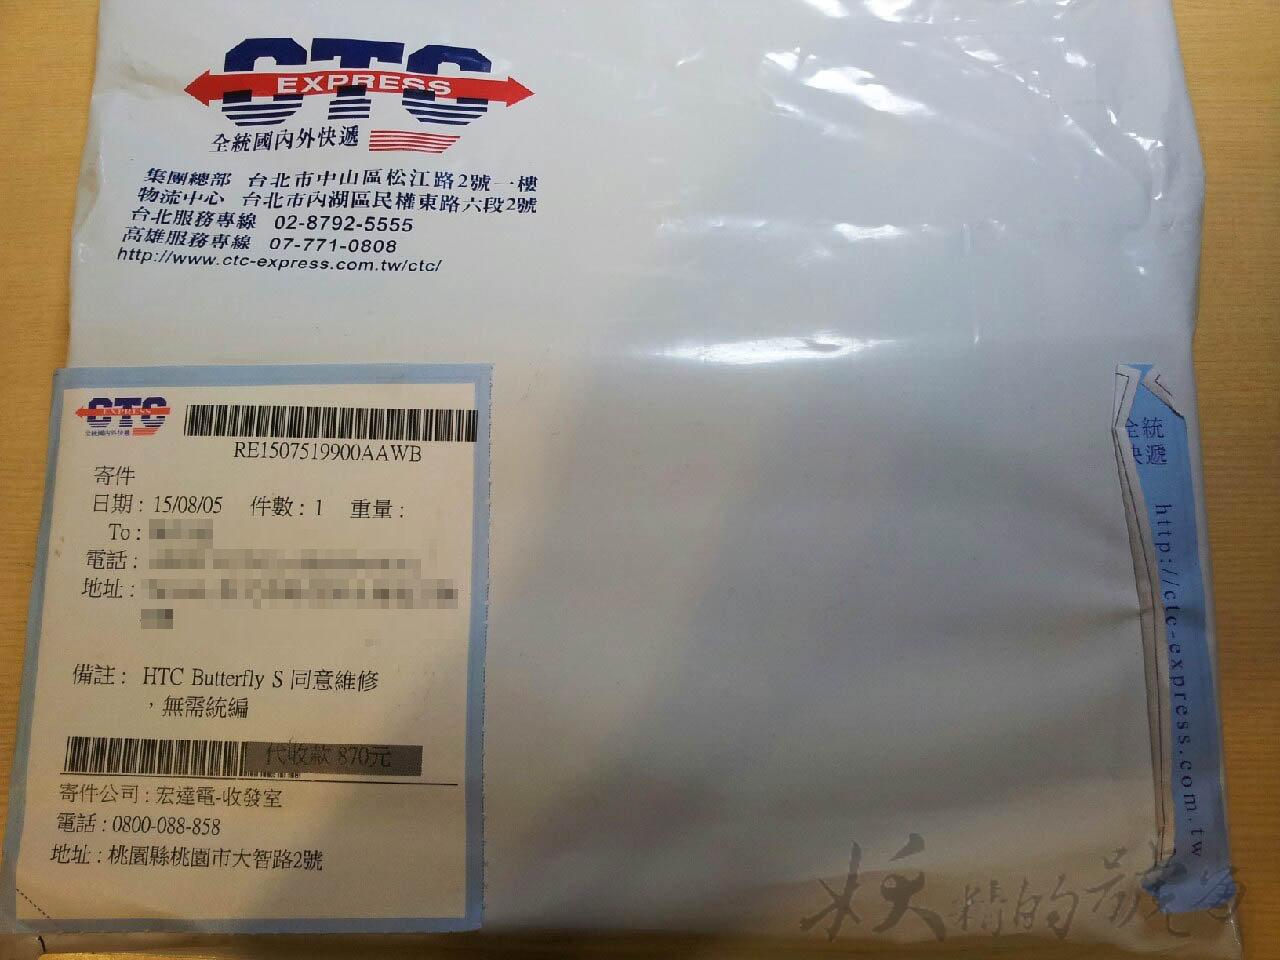 20150806 5490 - HTC Butterfly S 相機紫光 - 過保維修記(已s-off + Unlocked)